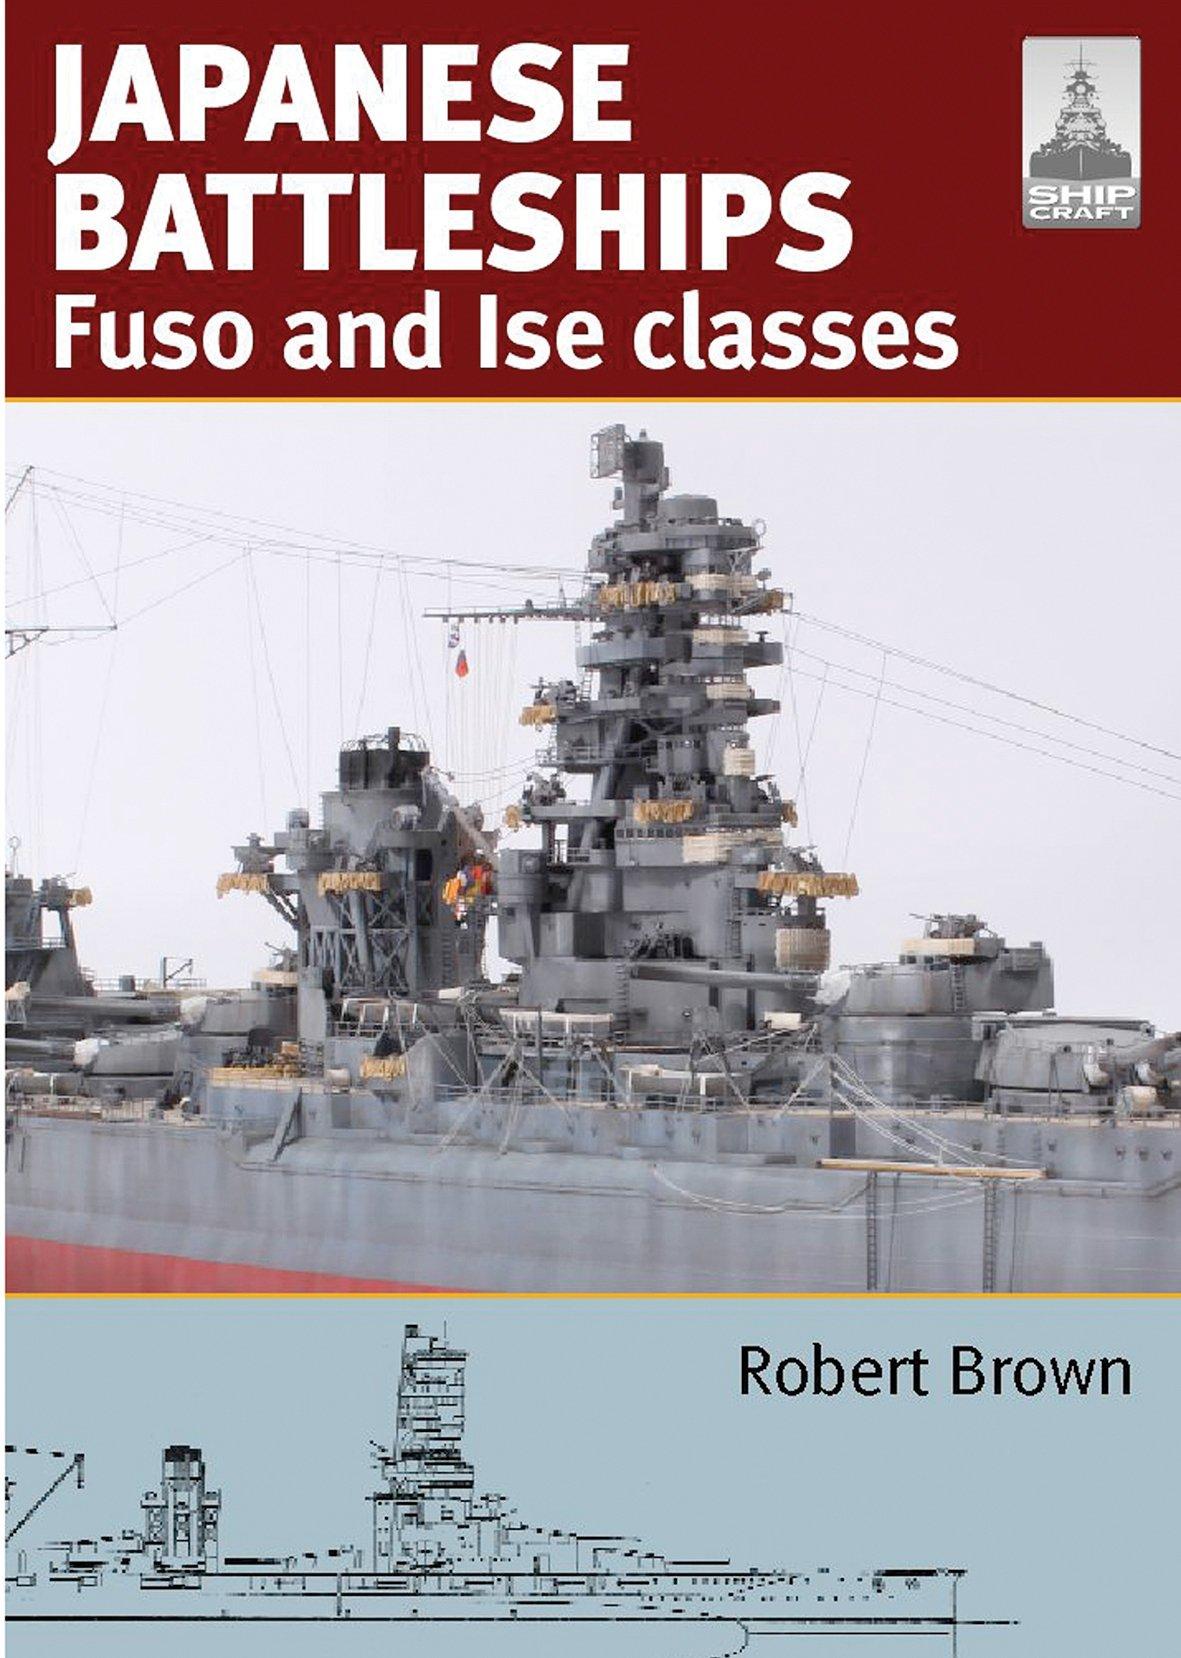 Japanese Battleships: Fuso & Ise Classes (ShipCraft Series)